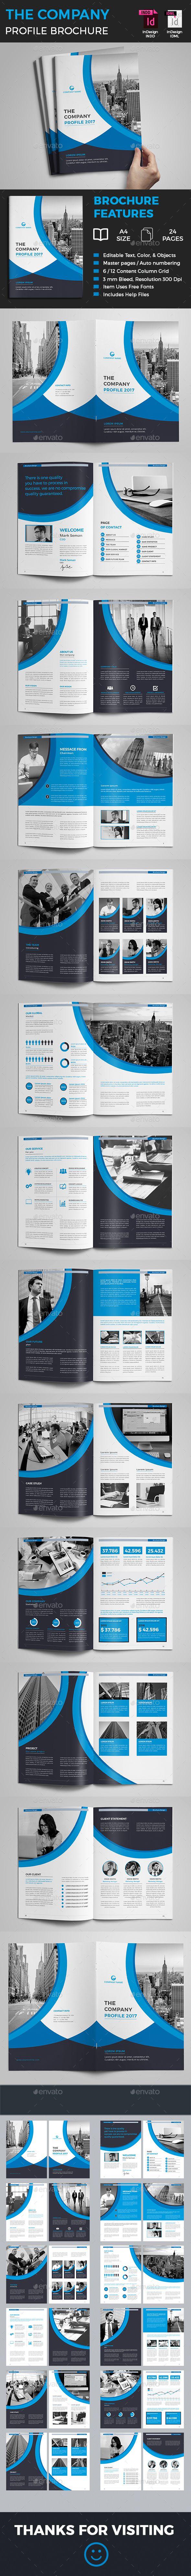 Company Profile Brochure - #Corporate #Brochures Download here: https://graphicriver.net/item/company-profile-brochure/19274603?ref=alena994